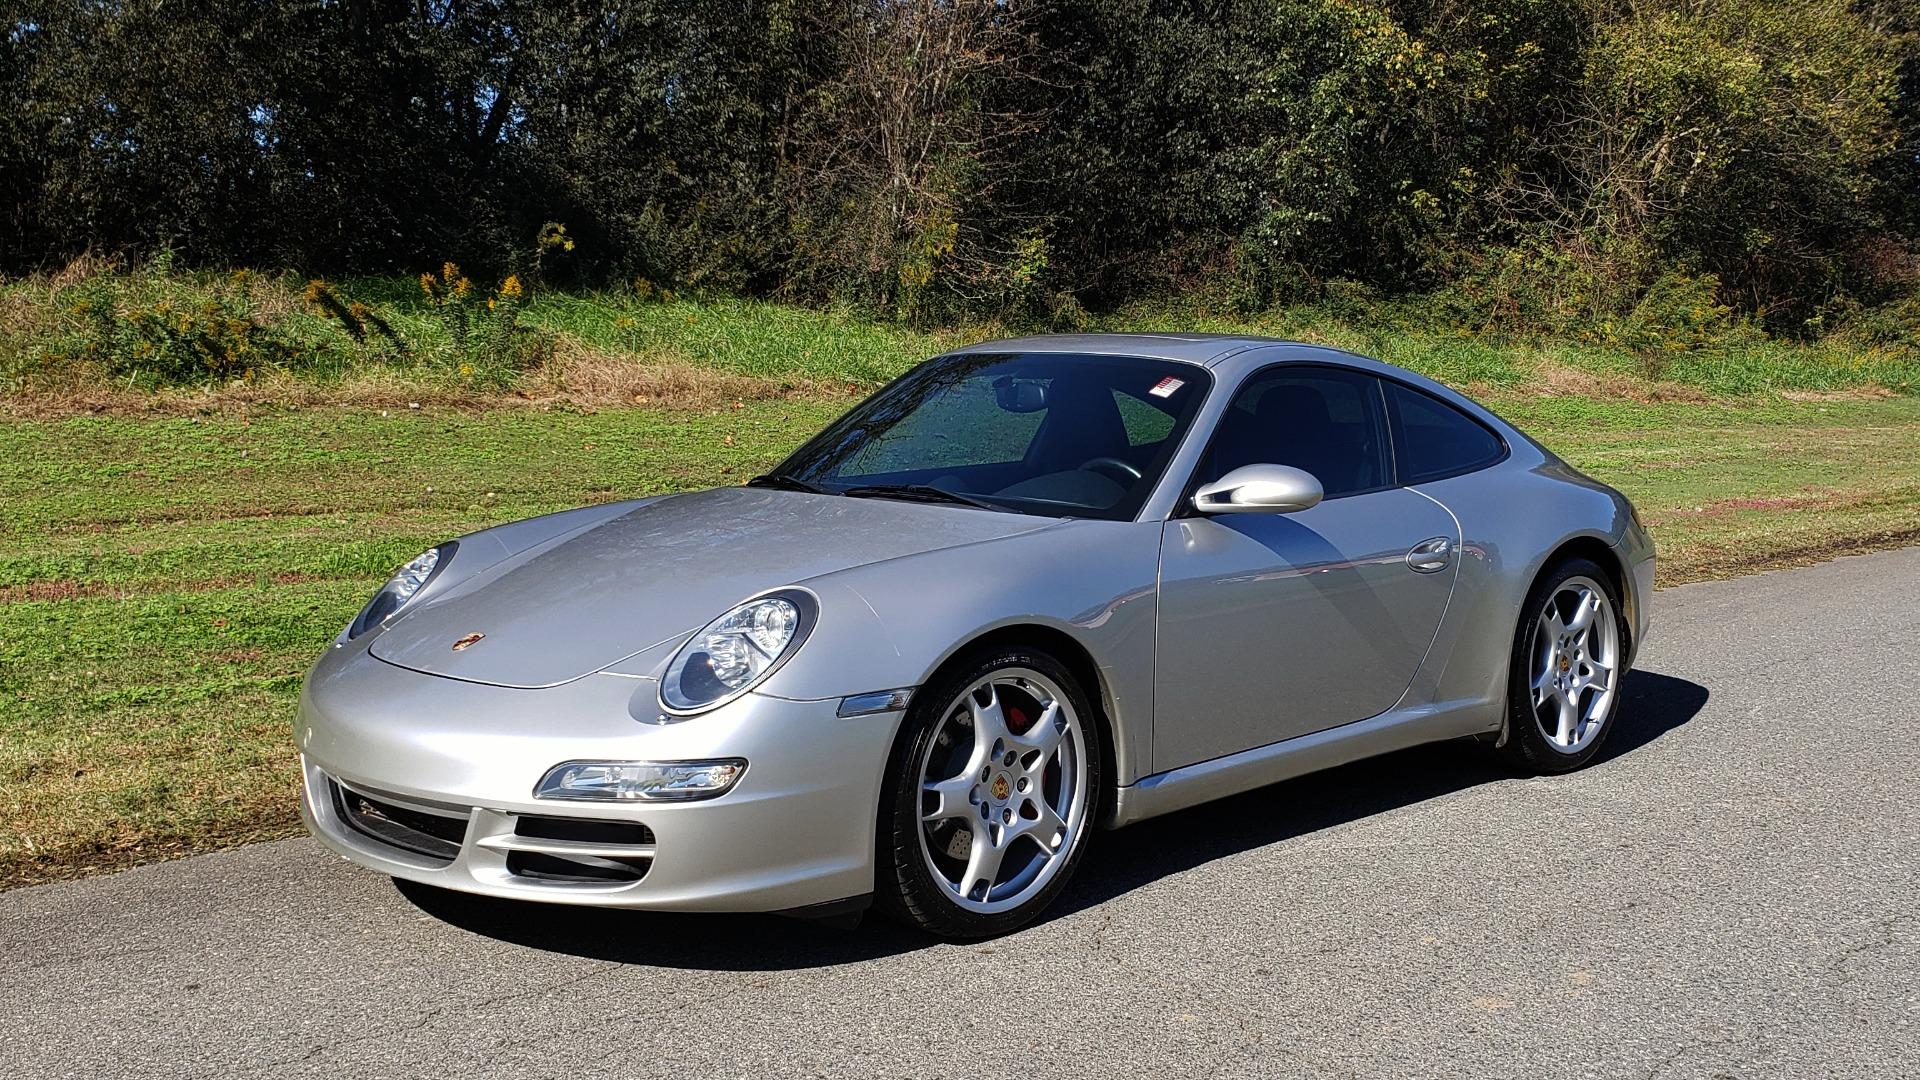 Used 2006 Porsche 911 CARRERA S / 5-SPD AUTO / SPORT CHRONO / NAV / BOSE / SUNROOF for sale Sold at Formula Imports in Charlotte NC 28227 4